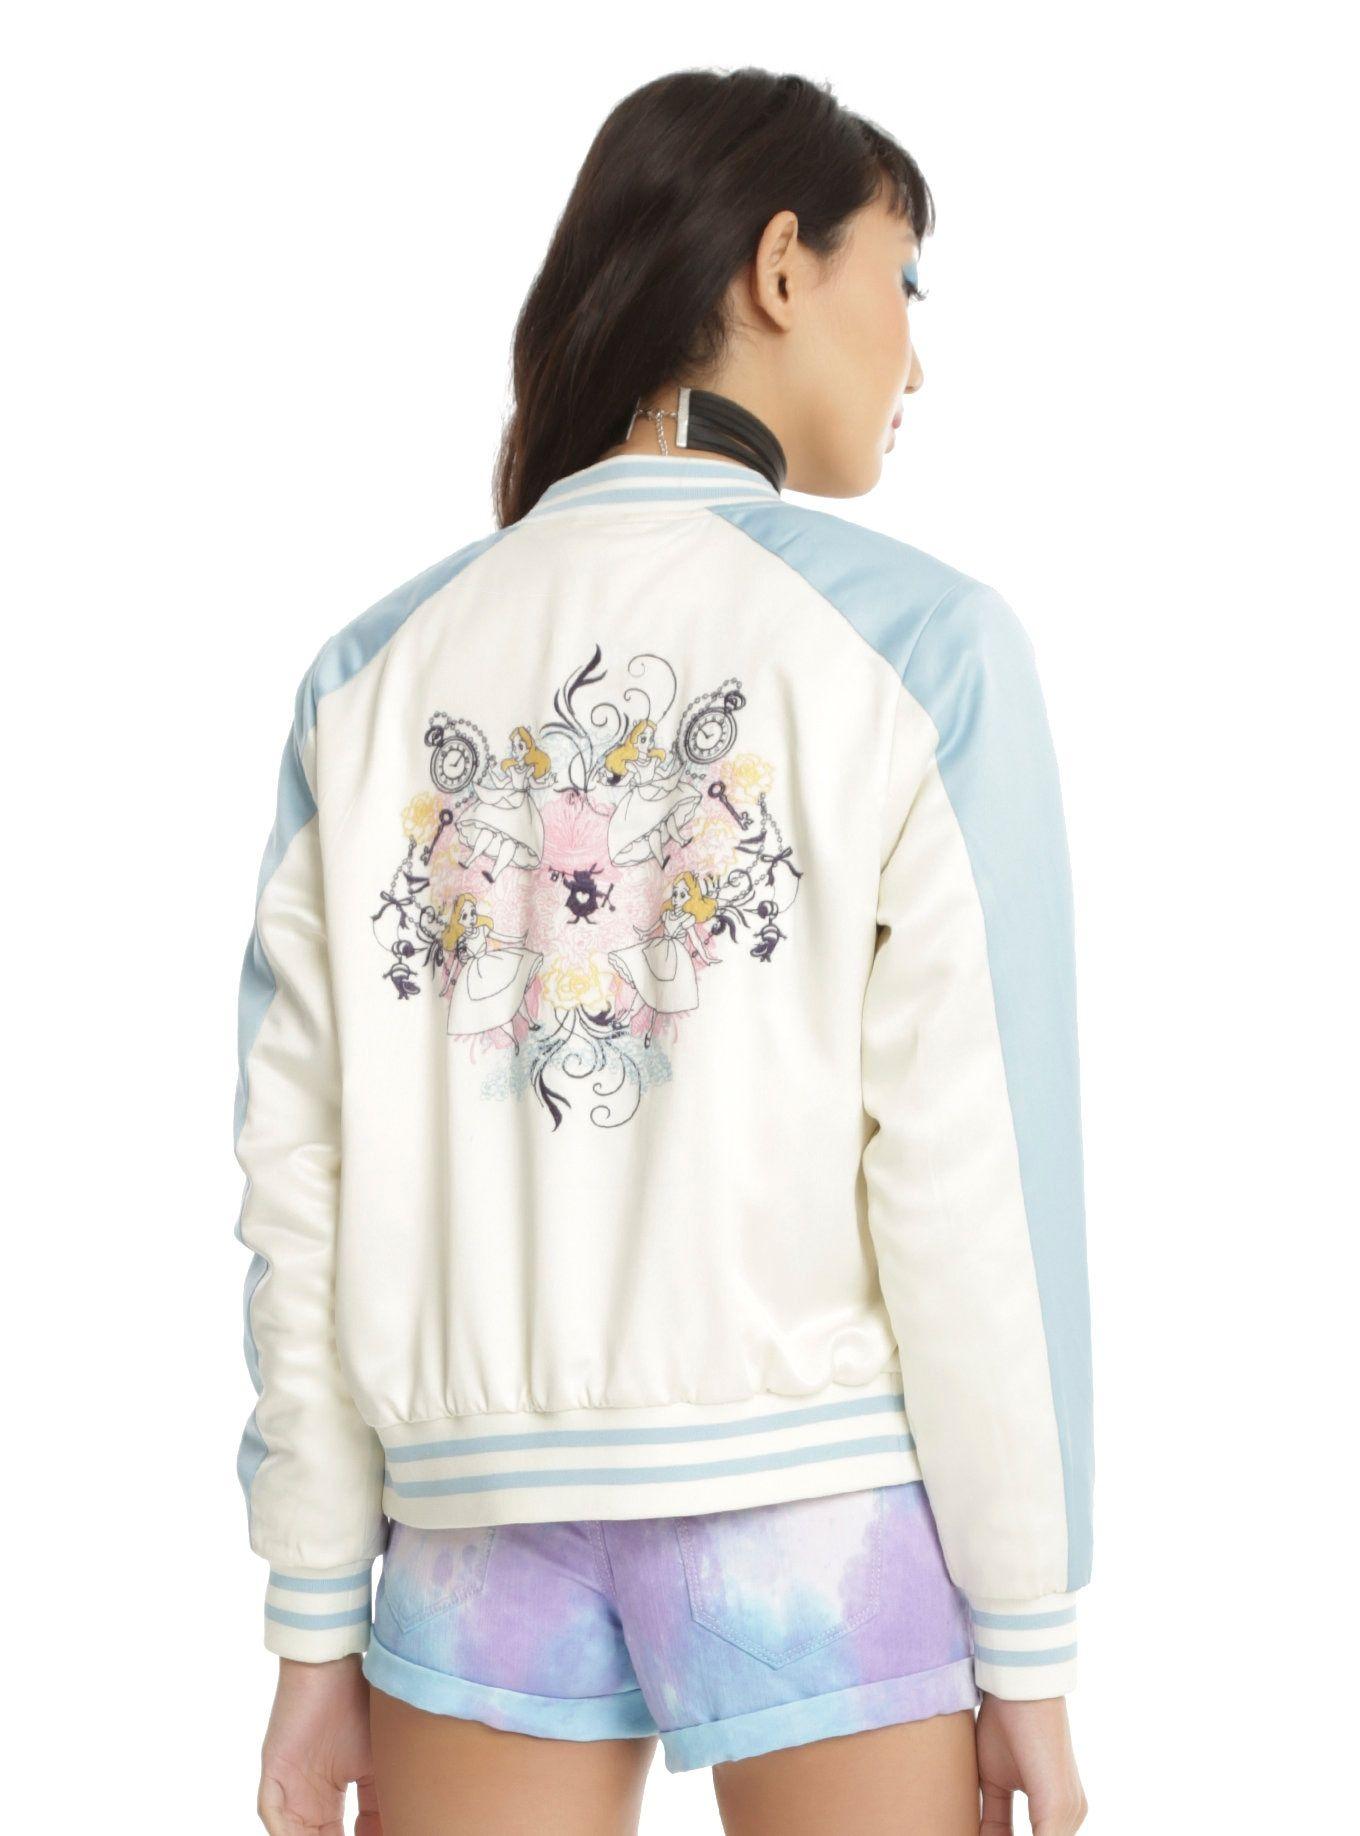 Disney Girls Alice in Wonderland Flowers Sweatshirt